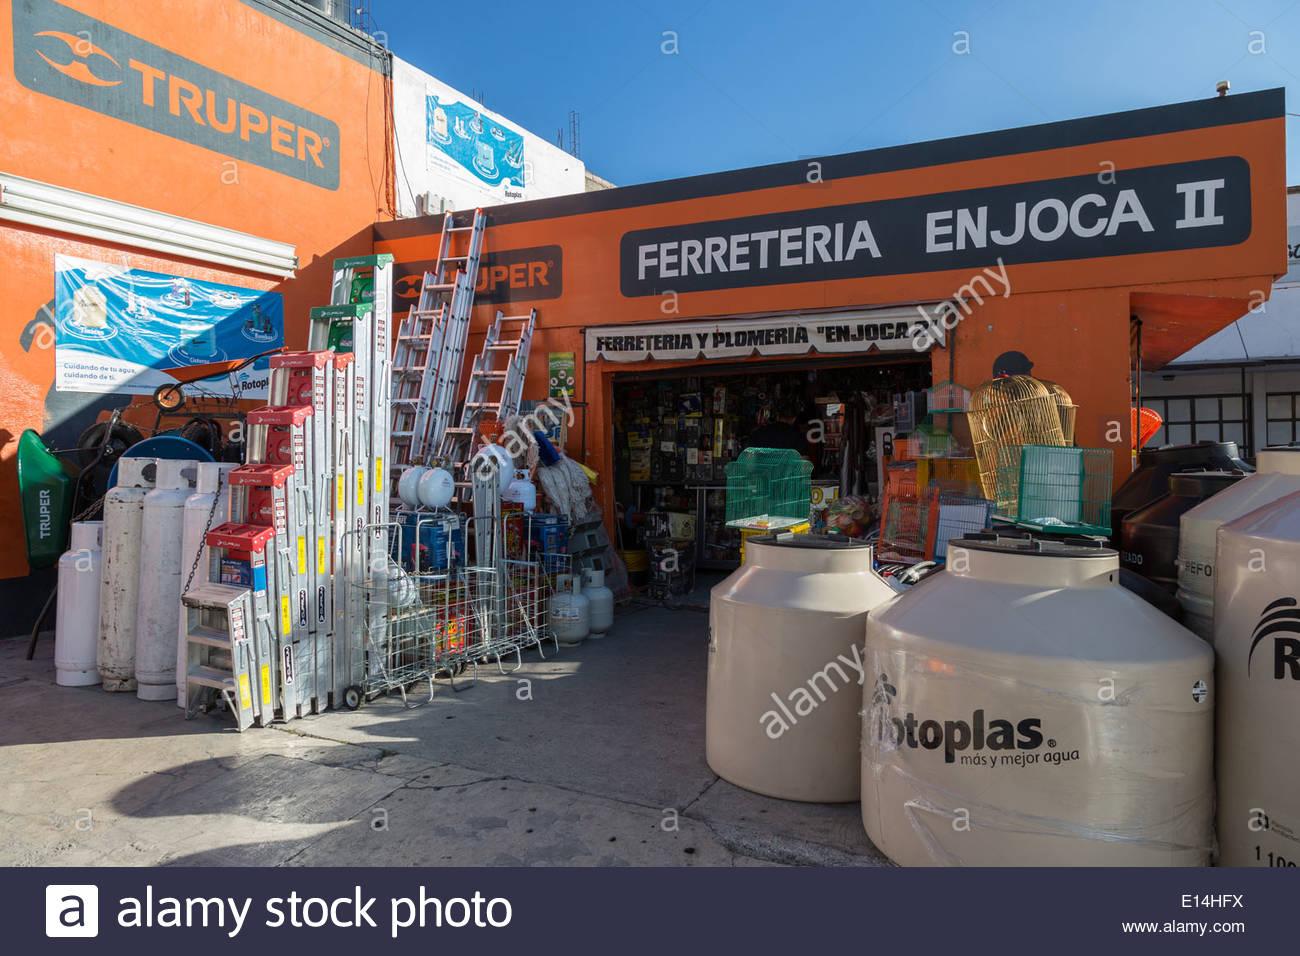 Ferreteria y construcci n sector ferretero estima crecer - Ferreteria las castillas ...